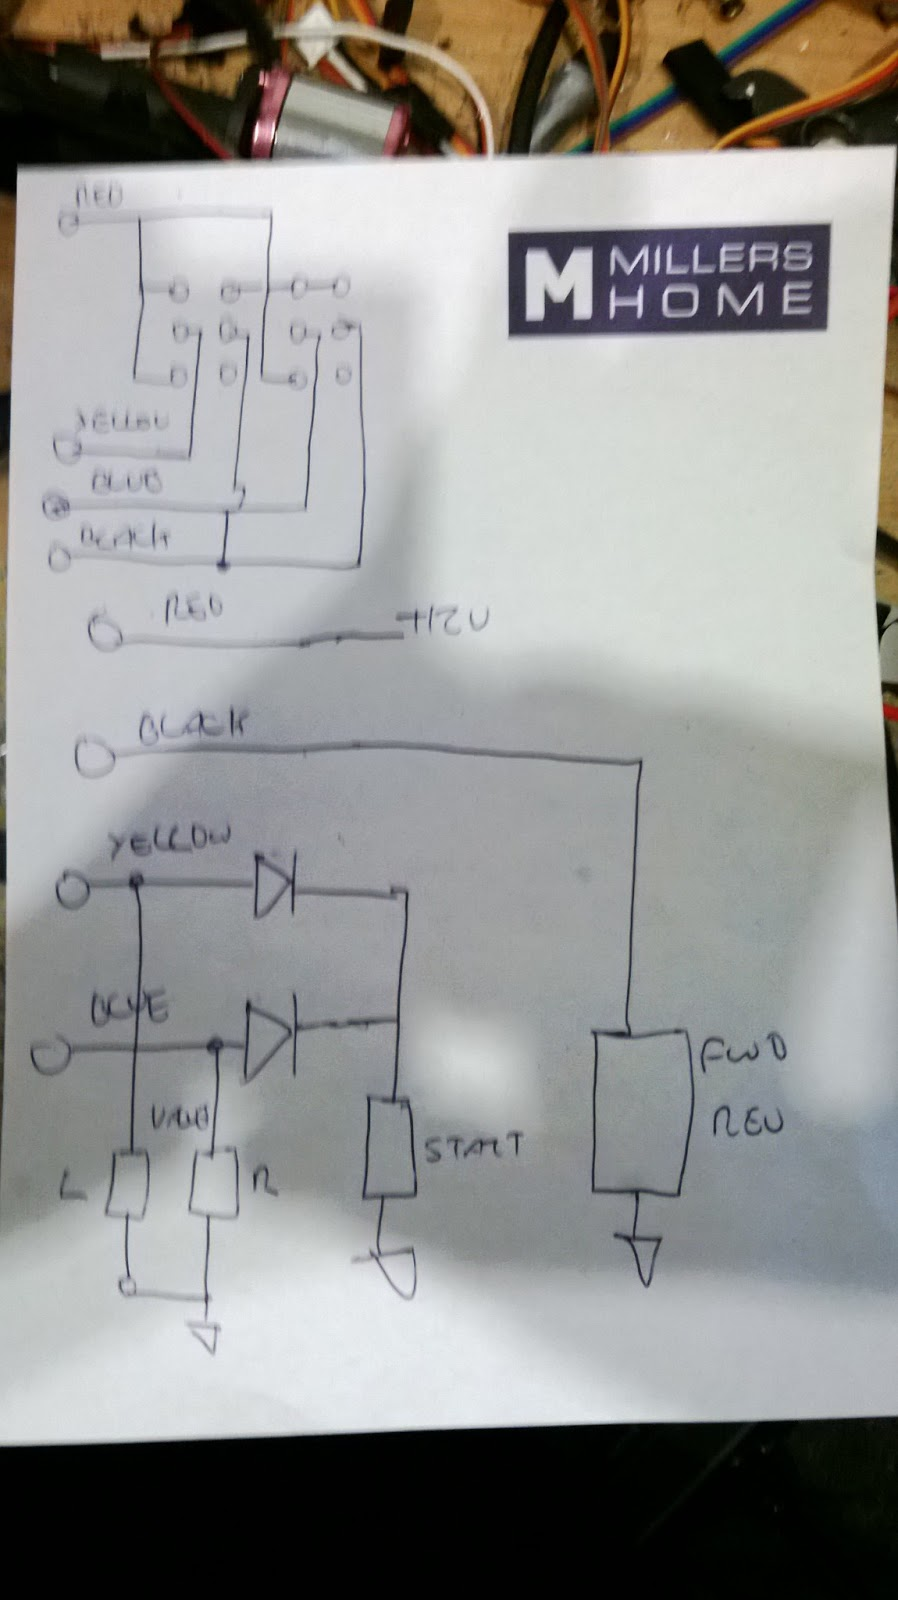 Nett Insta Trim Schaltplan Ideen - Schaltplan Serie Circuit ...